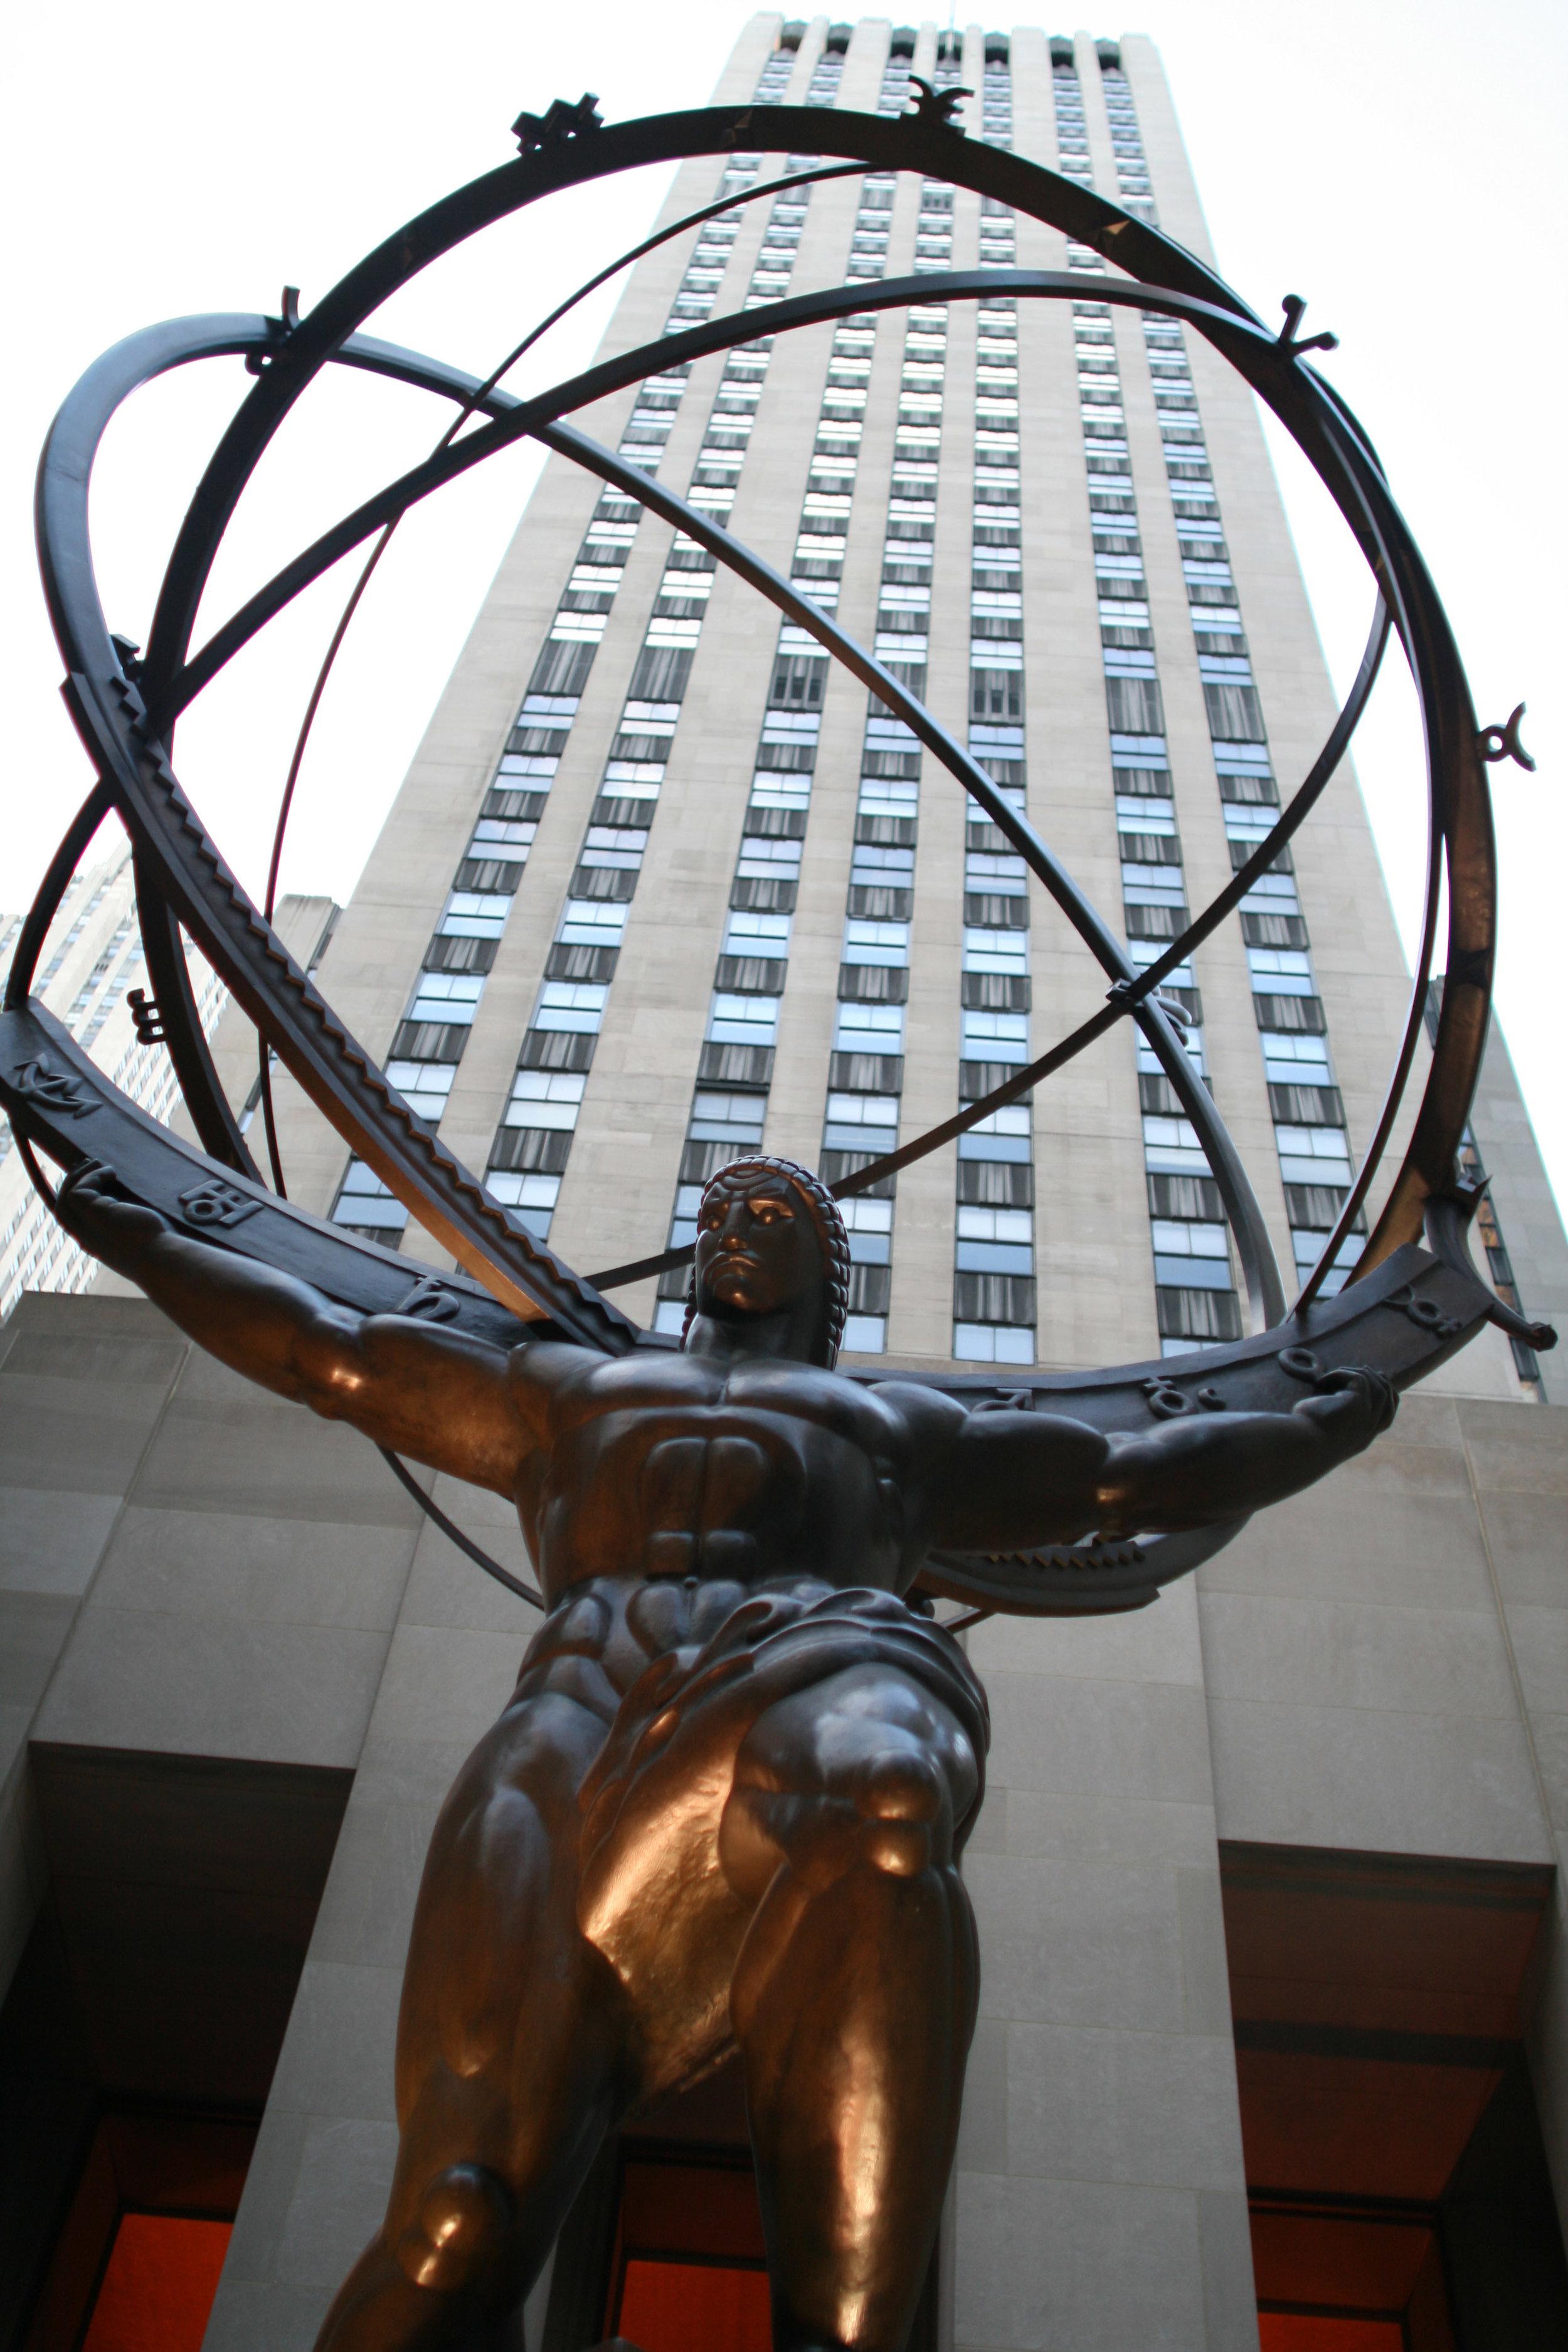 Lee Lawrie's bronze statue of Atlas at Rockefeller Centre. (ThreeOneFive/Wikimedia Commons)